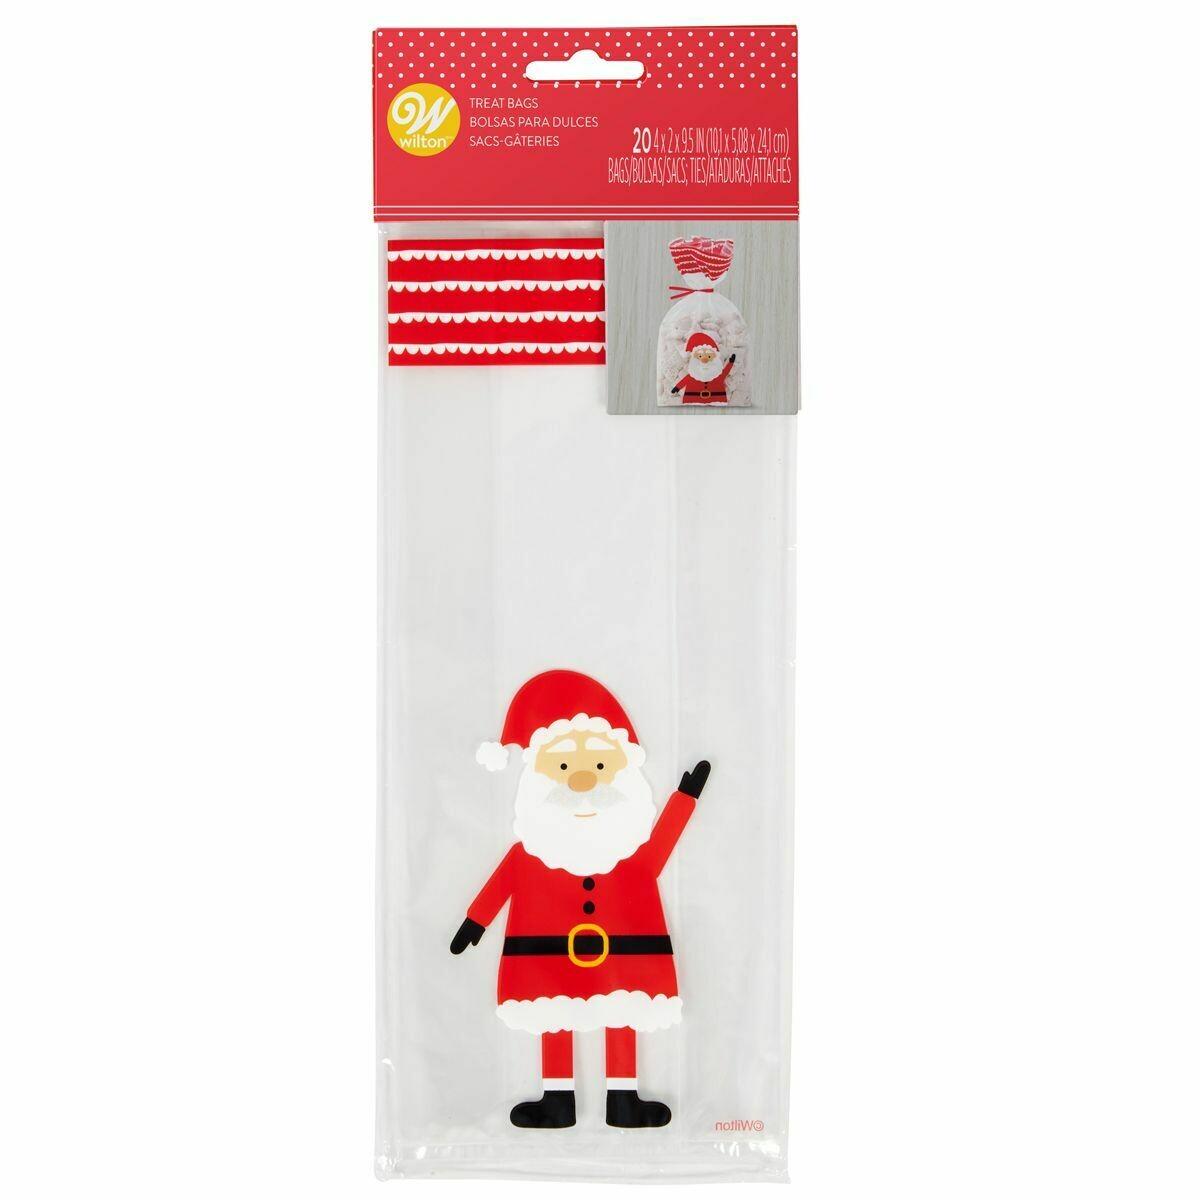 Wilton Christmas Treat Bags -SANTA CLAUS -Pack of 20 - 20τεμ Σακουλάκια για γλυκά με συρματάκια Άγιος Βασίλης